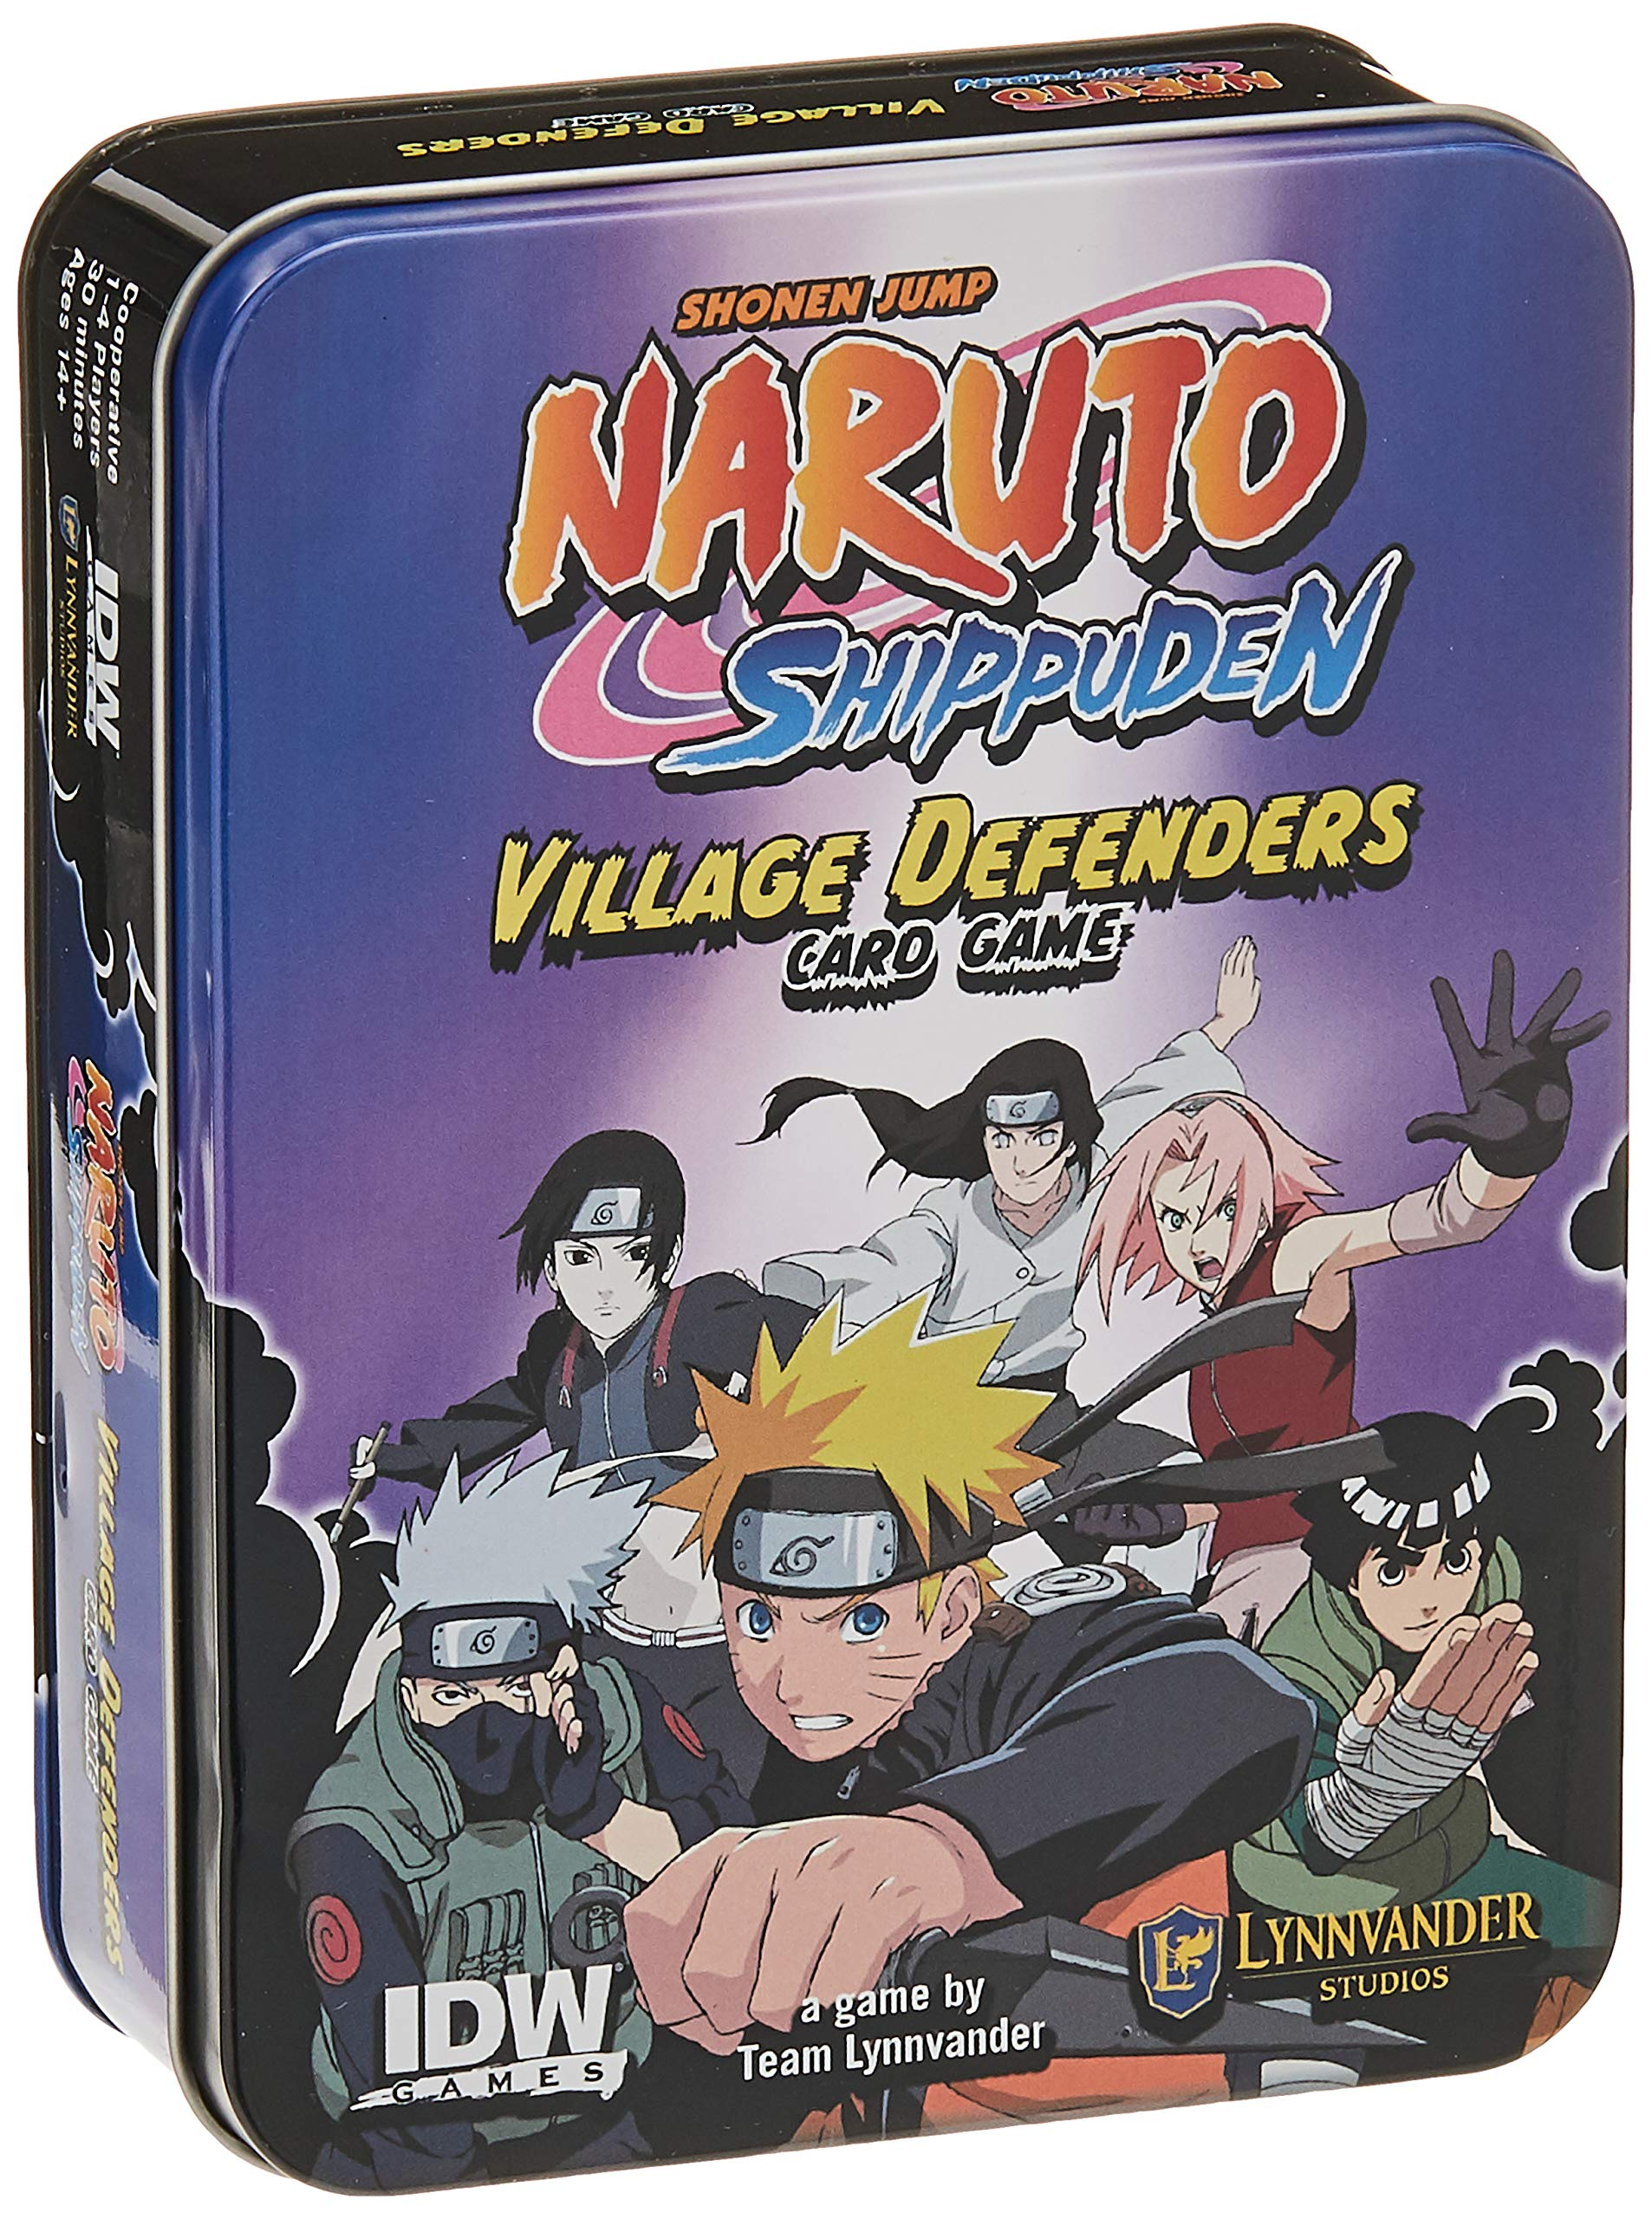 Naruto DEC190745 Card Game